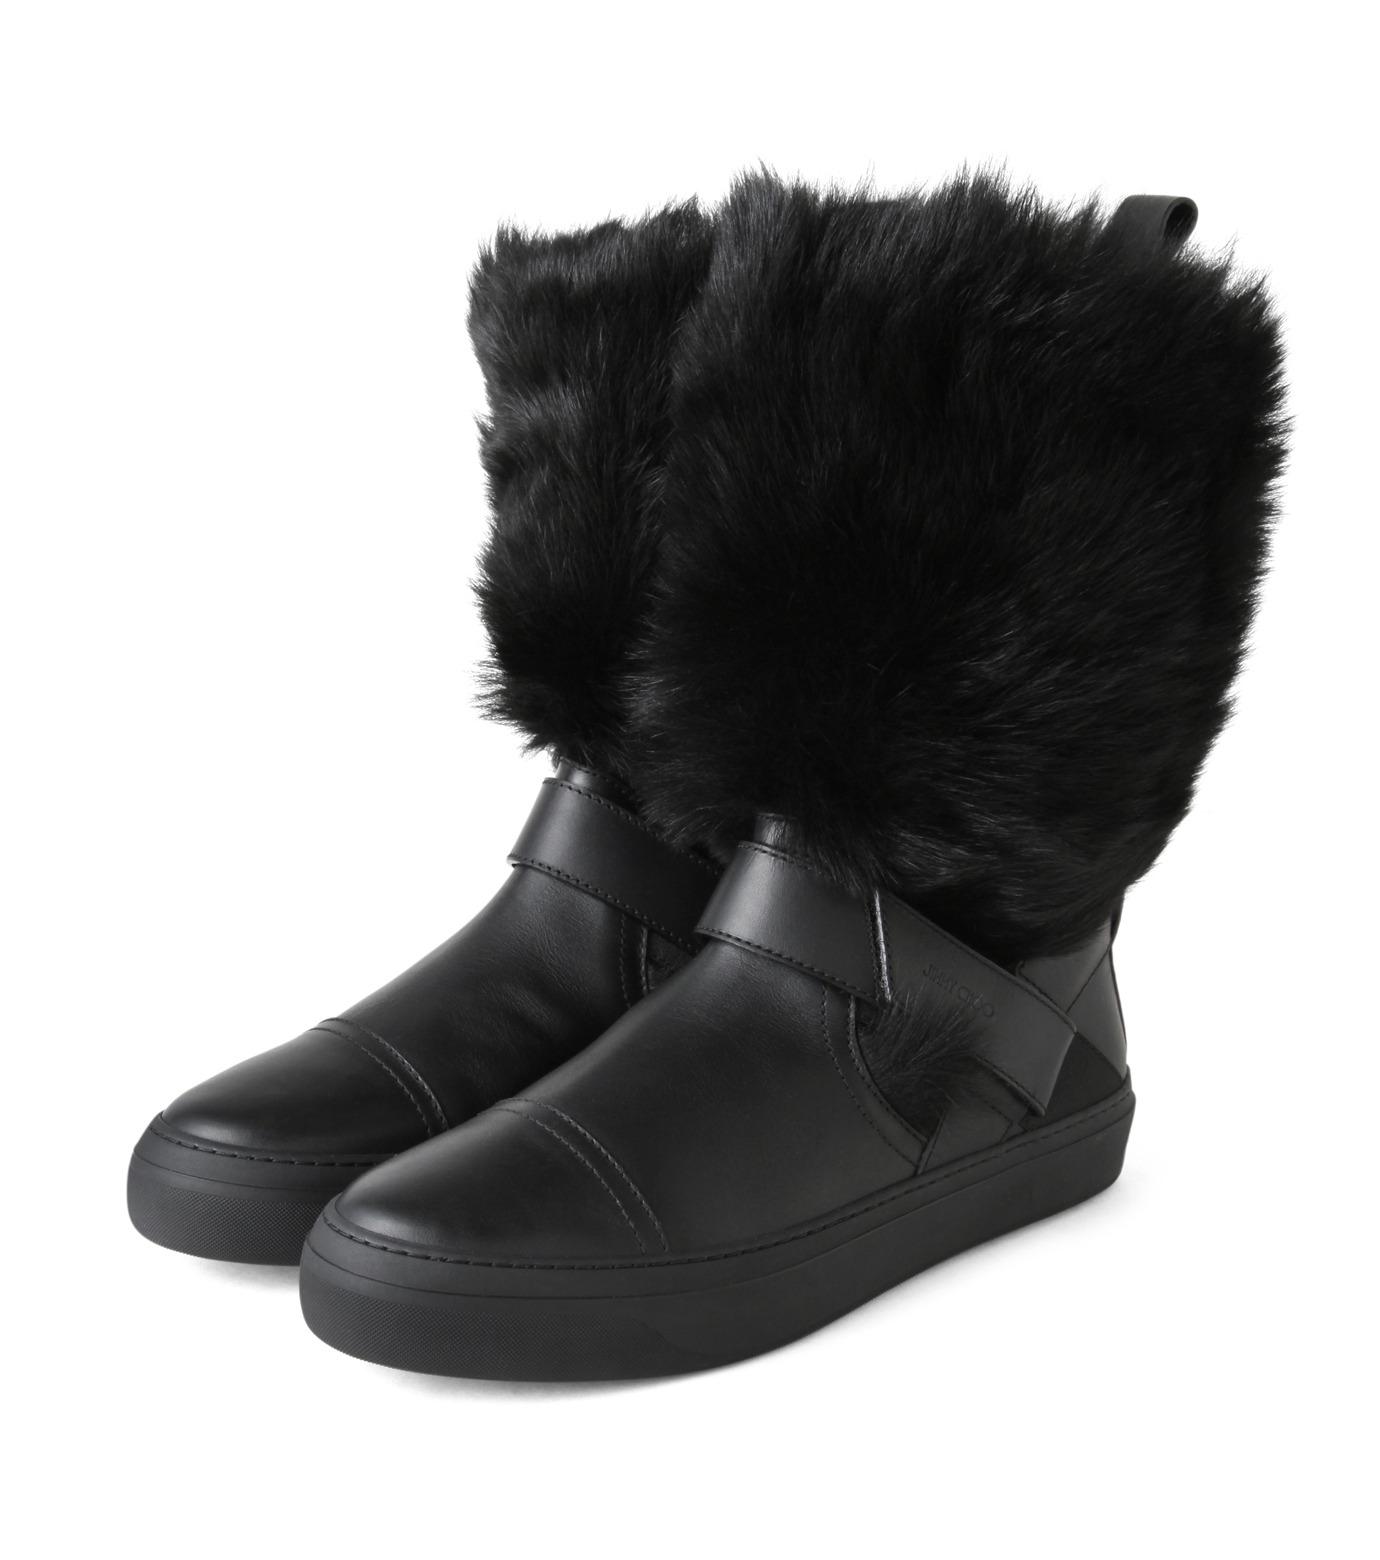 Jimmy Choo(ジミーチュウ)のFur Boots-BLACK(ブーツ/boots)-152BARRY-LWF-13 拡大詳細画像4